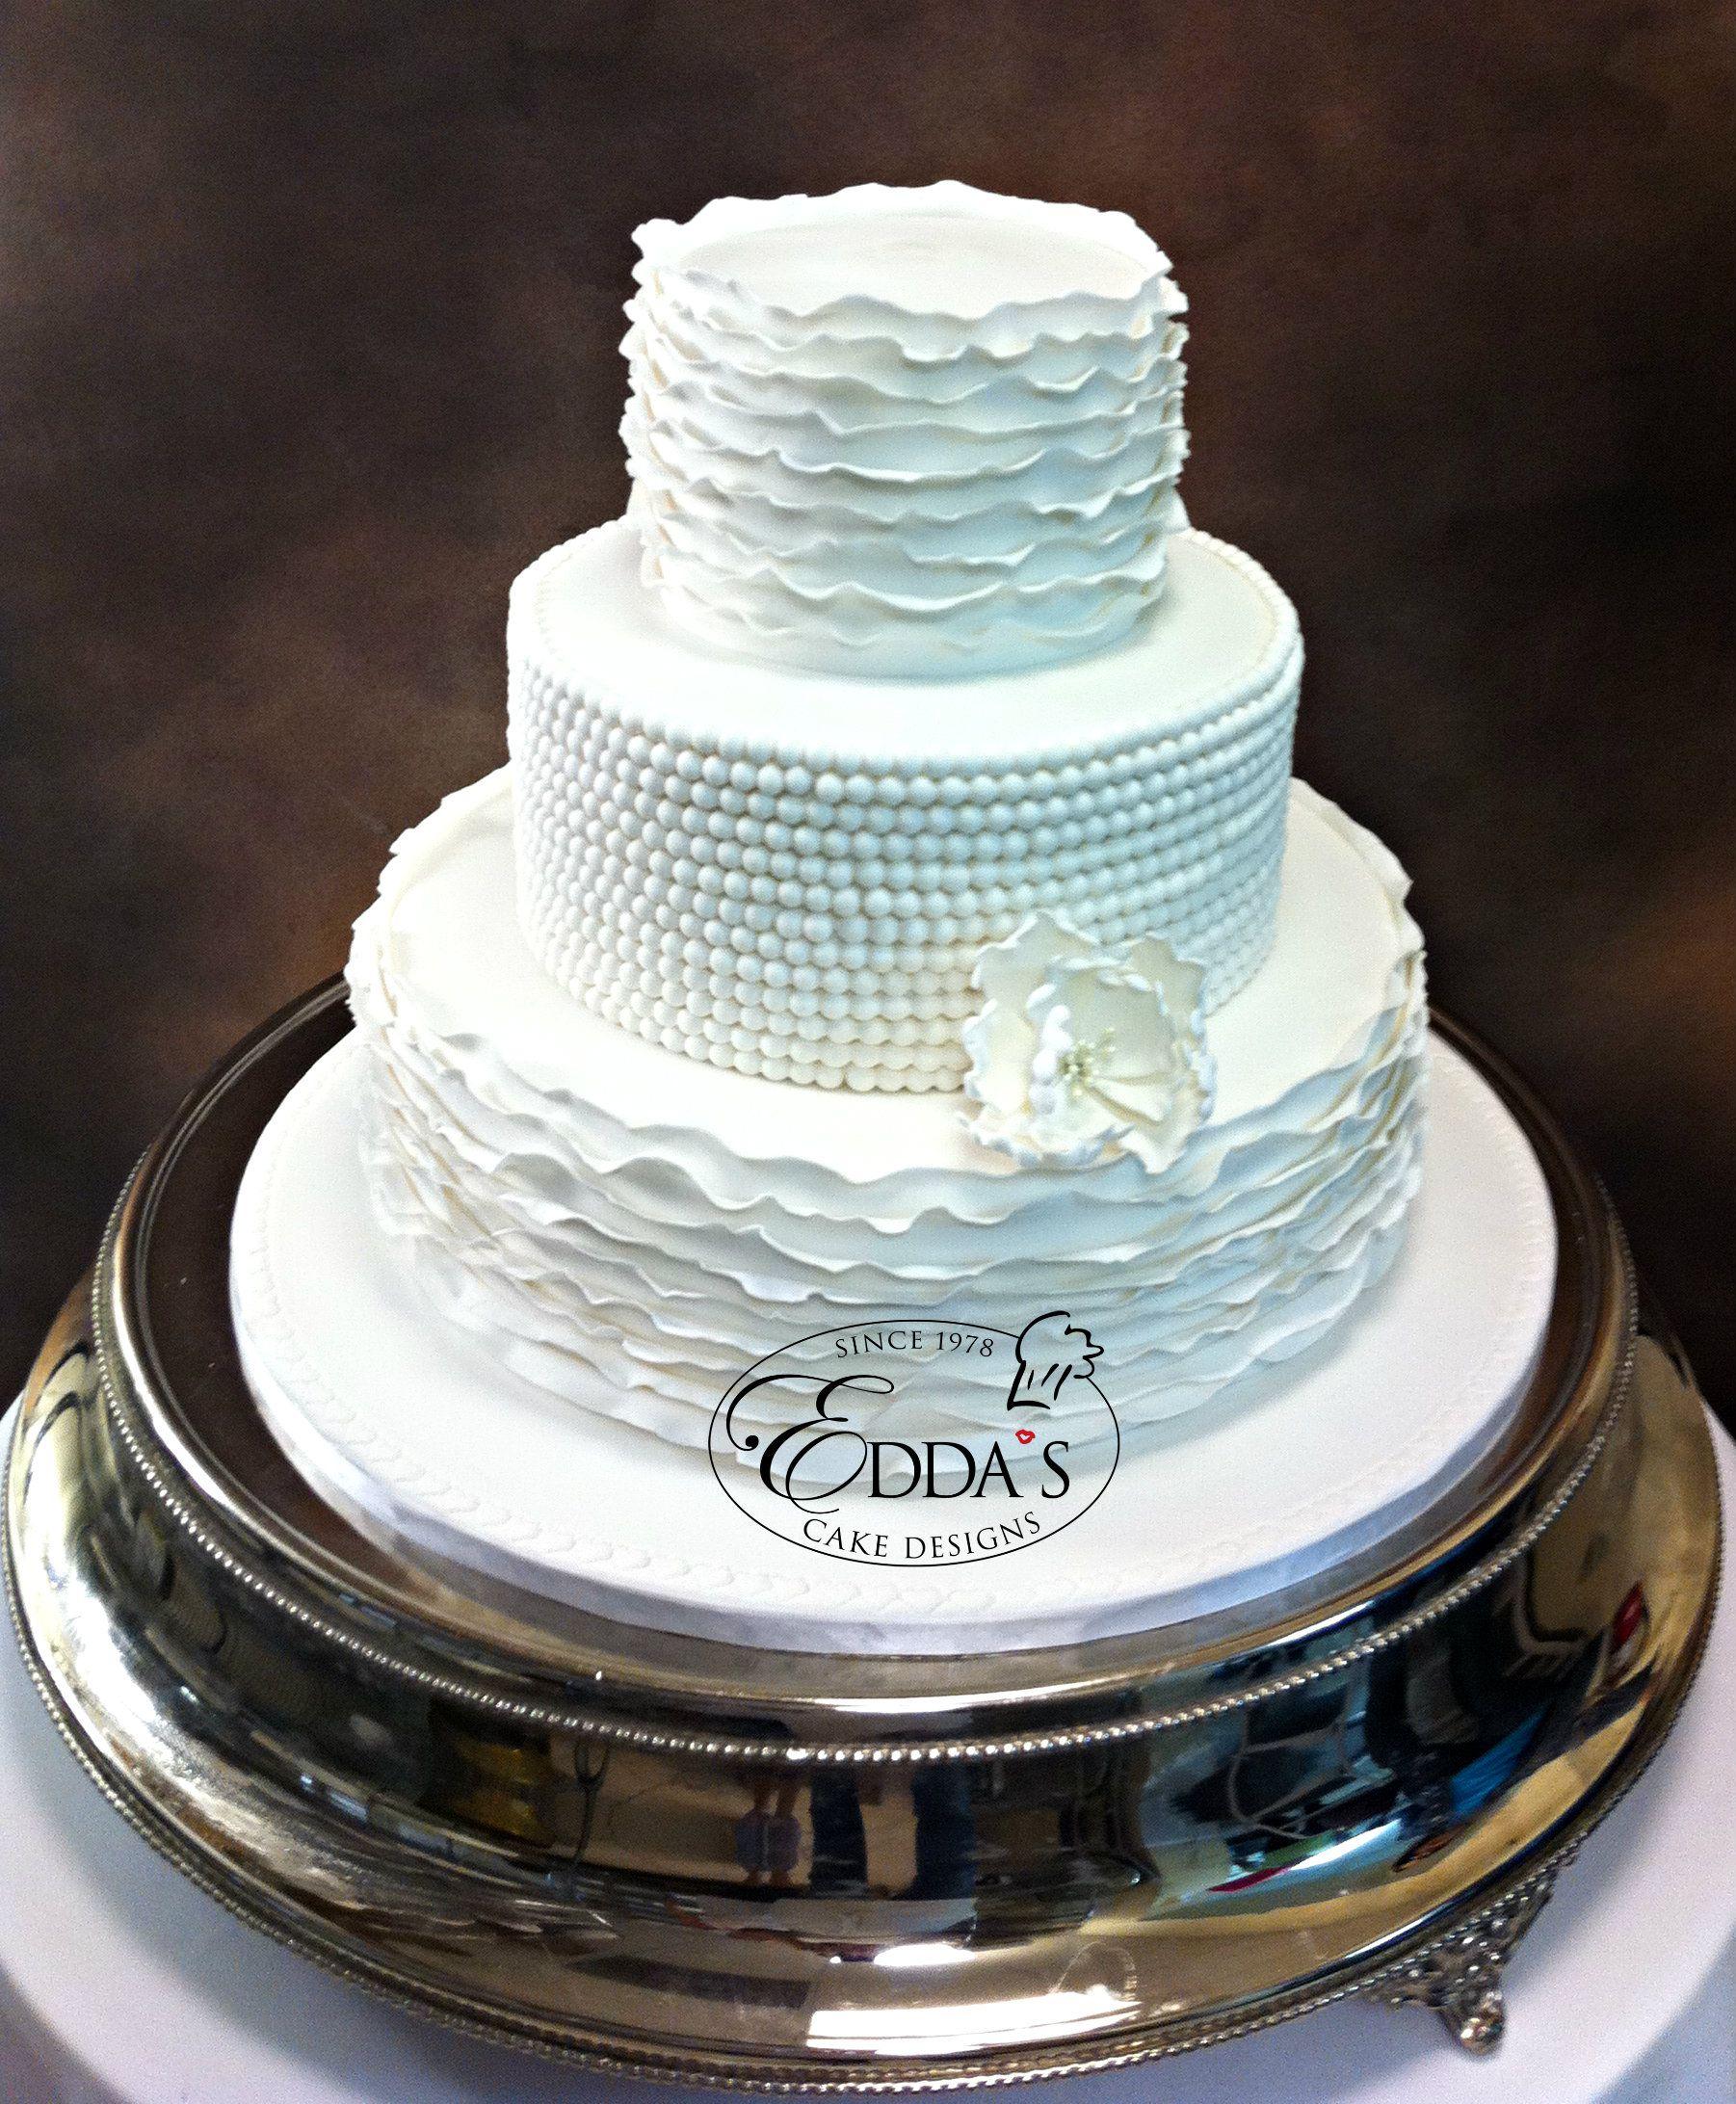 Cake Designs By Edda : Pin by Edda s Cake Designs on Latest Creations - March ...